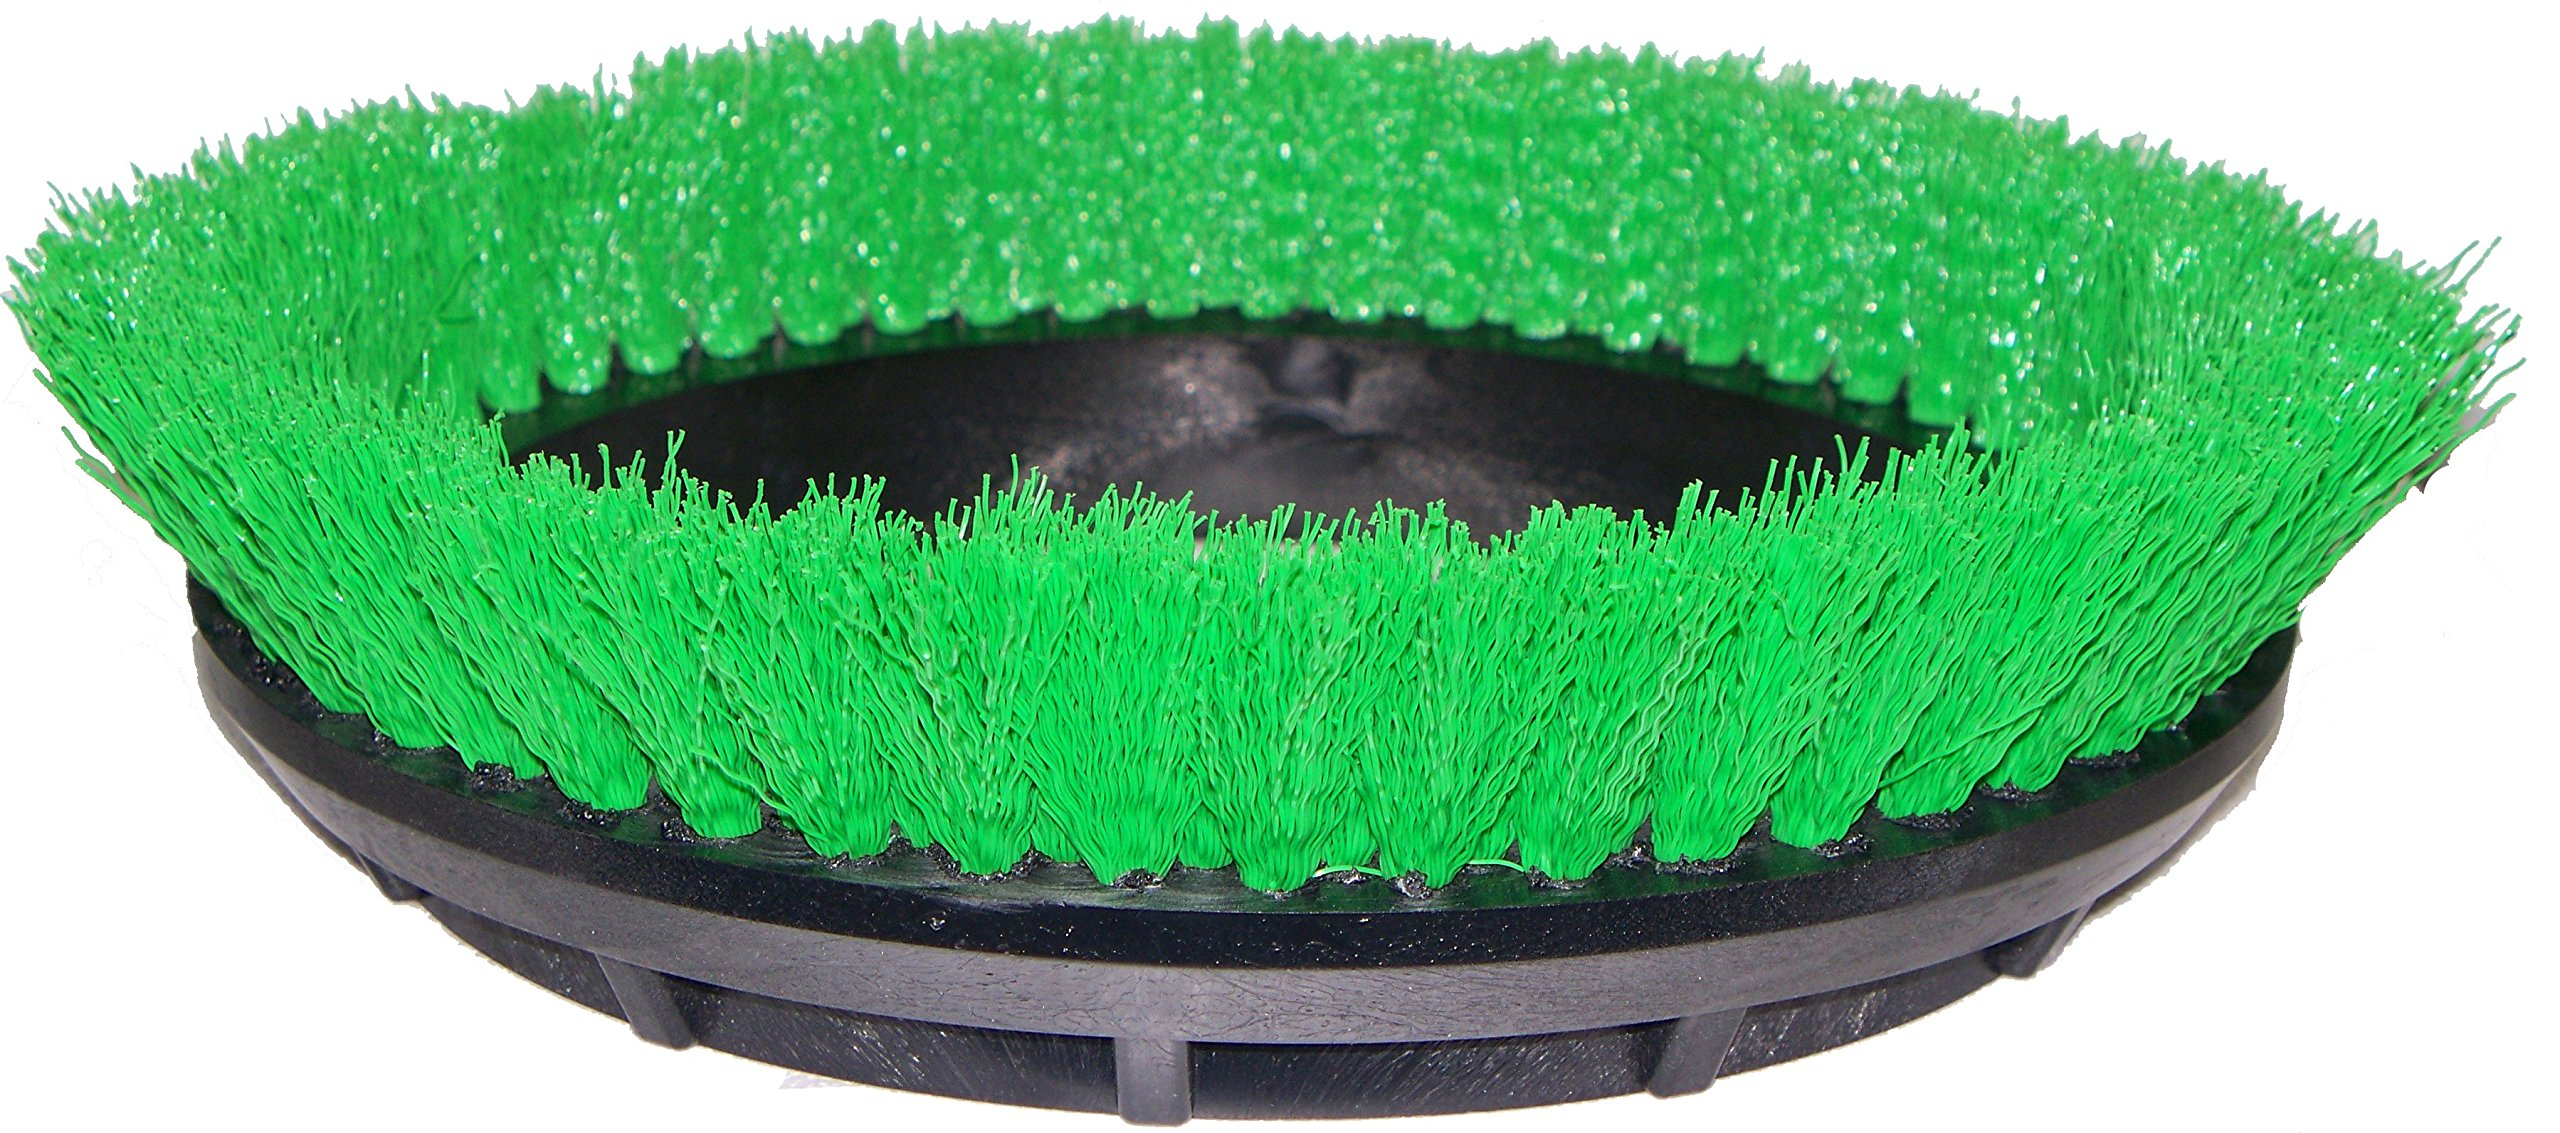 BISSELL BigGreen Commercial 237.057BG Scrub Brush, 0.015'' Bristle Diameter Crimped Polypropylene for BGEM9000 Easy Motion Floor Machine, 12'', Green